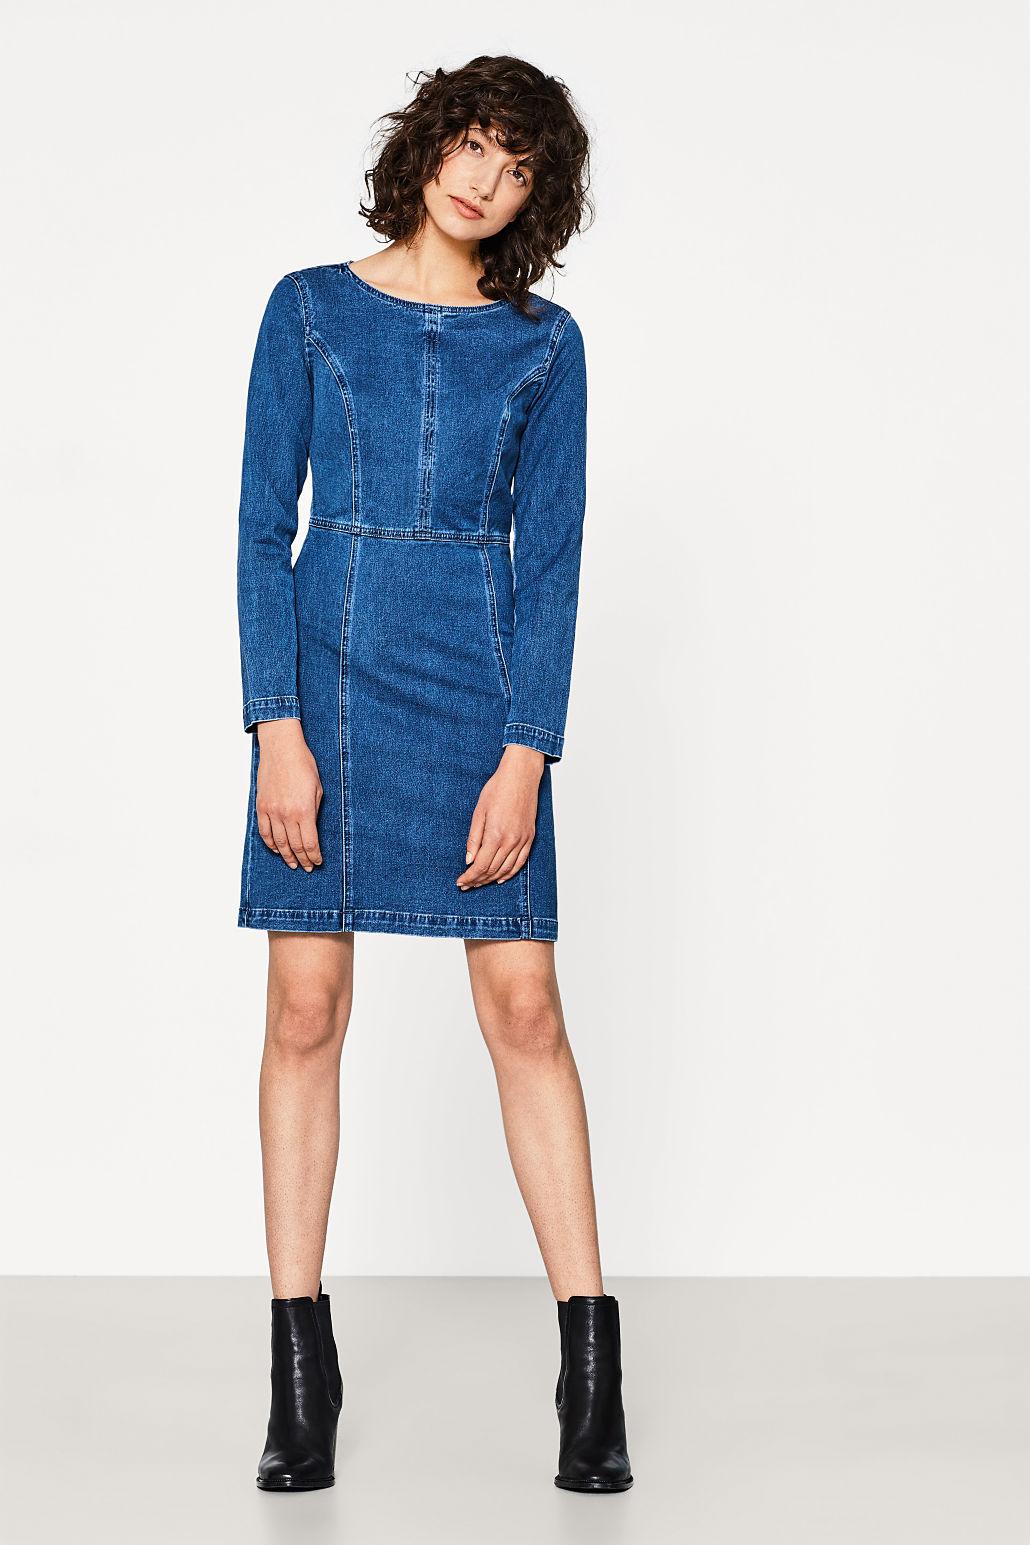 Edc by Esprit Robe en jean blue medium wash - Robe Femme Esprit ... 15a49d9576